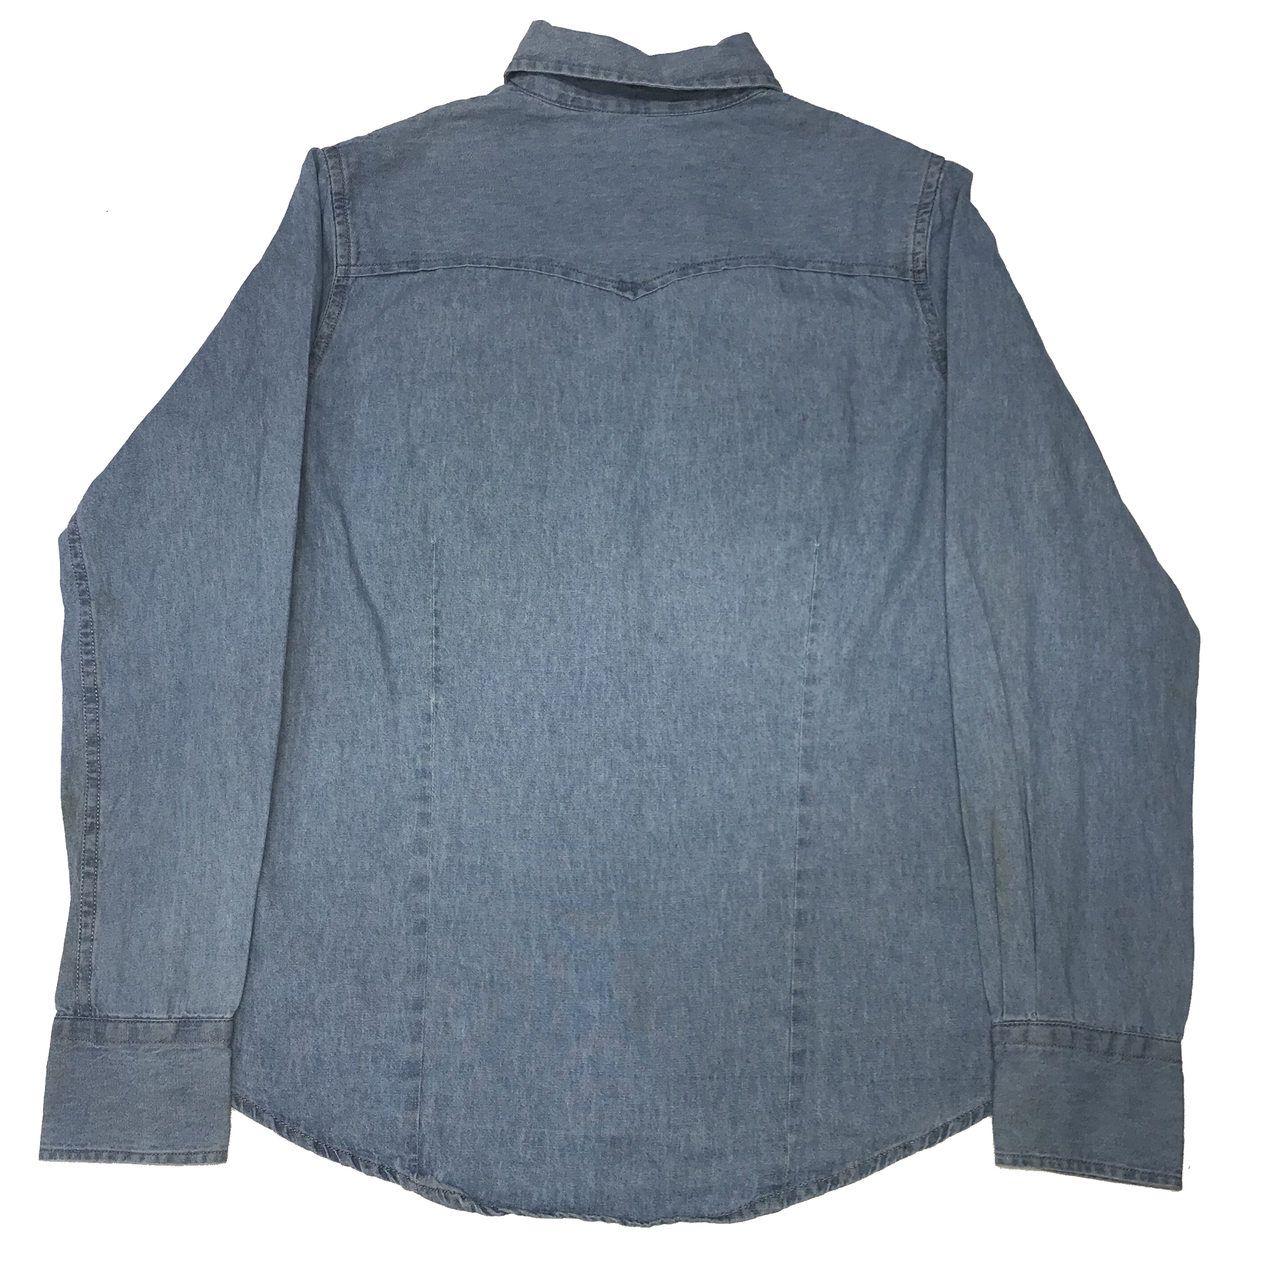 Camisa Jeans Feminina  - Boutique Mangalarga